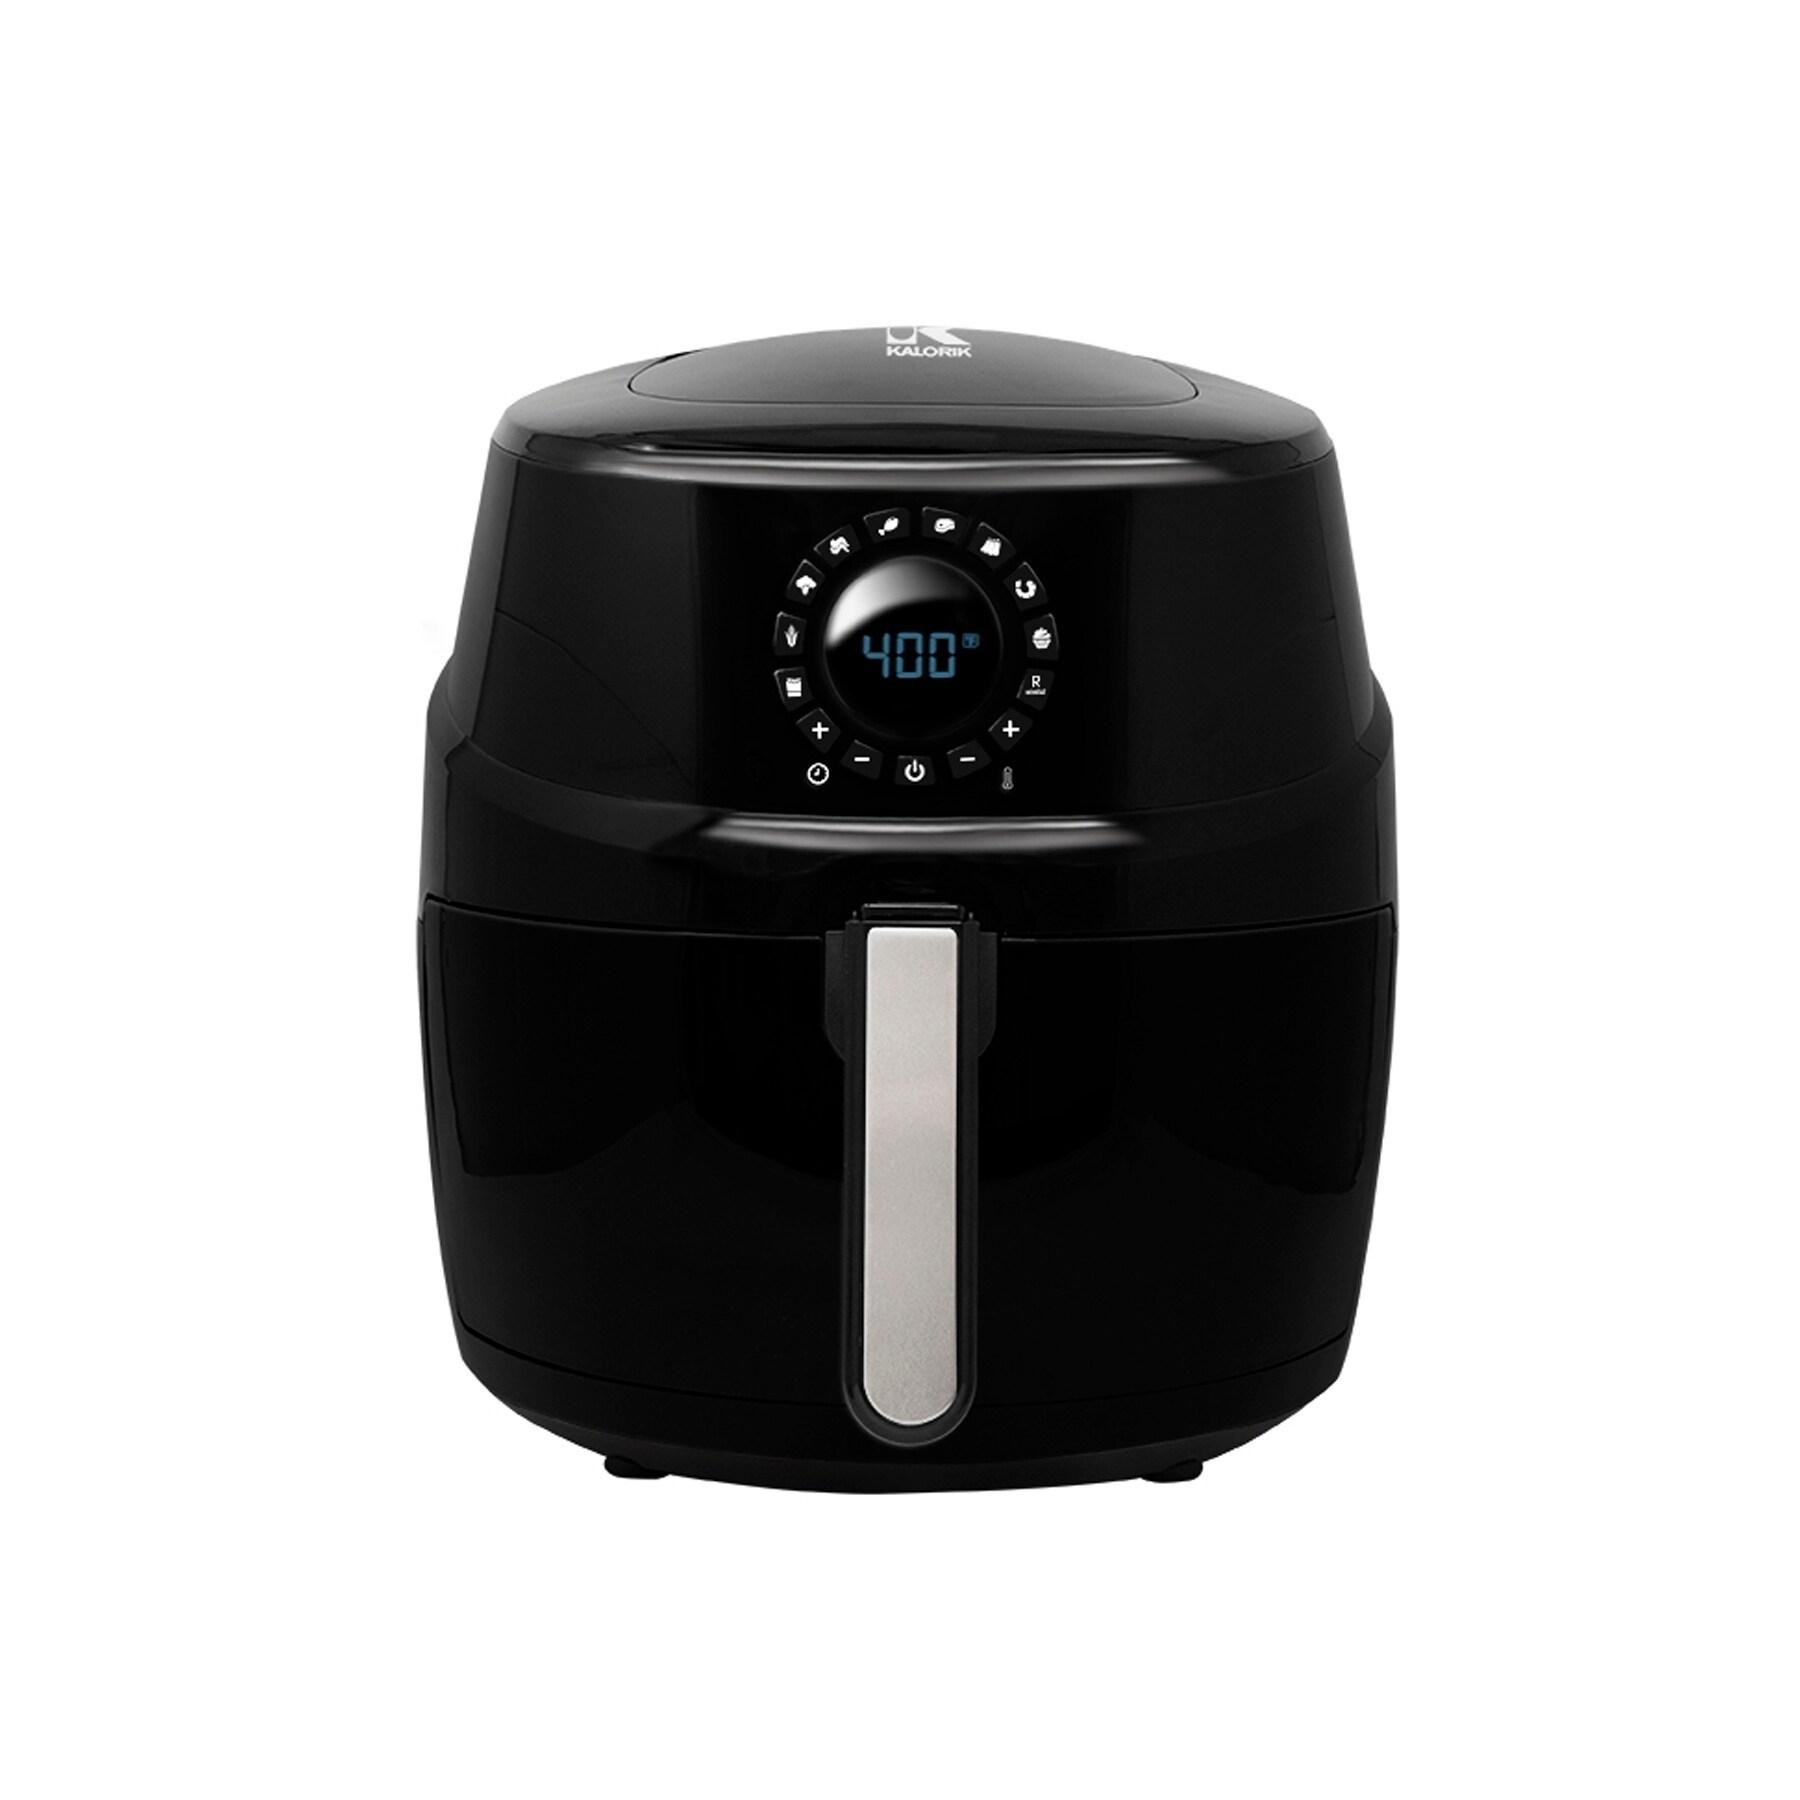 Kalorik XL Digital Air Fryer